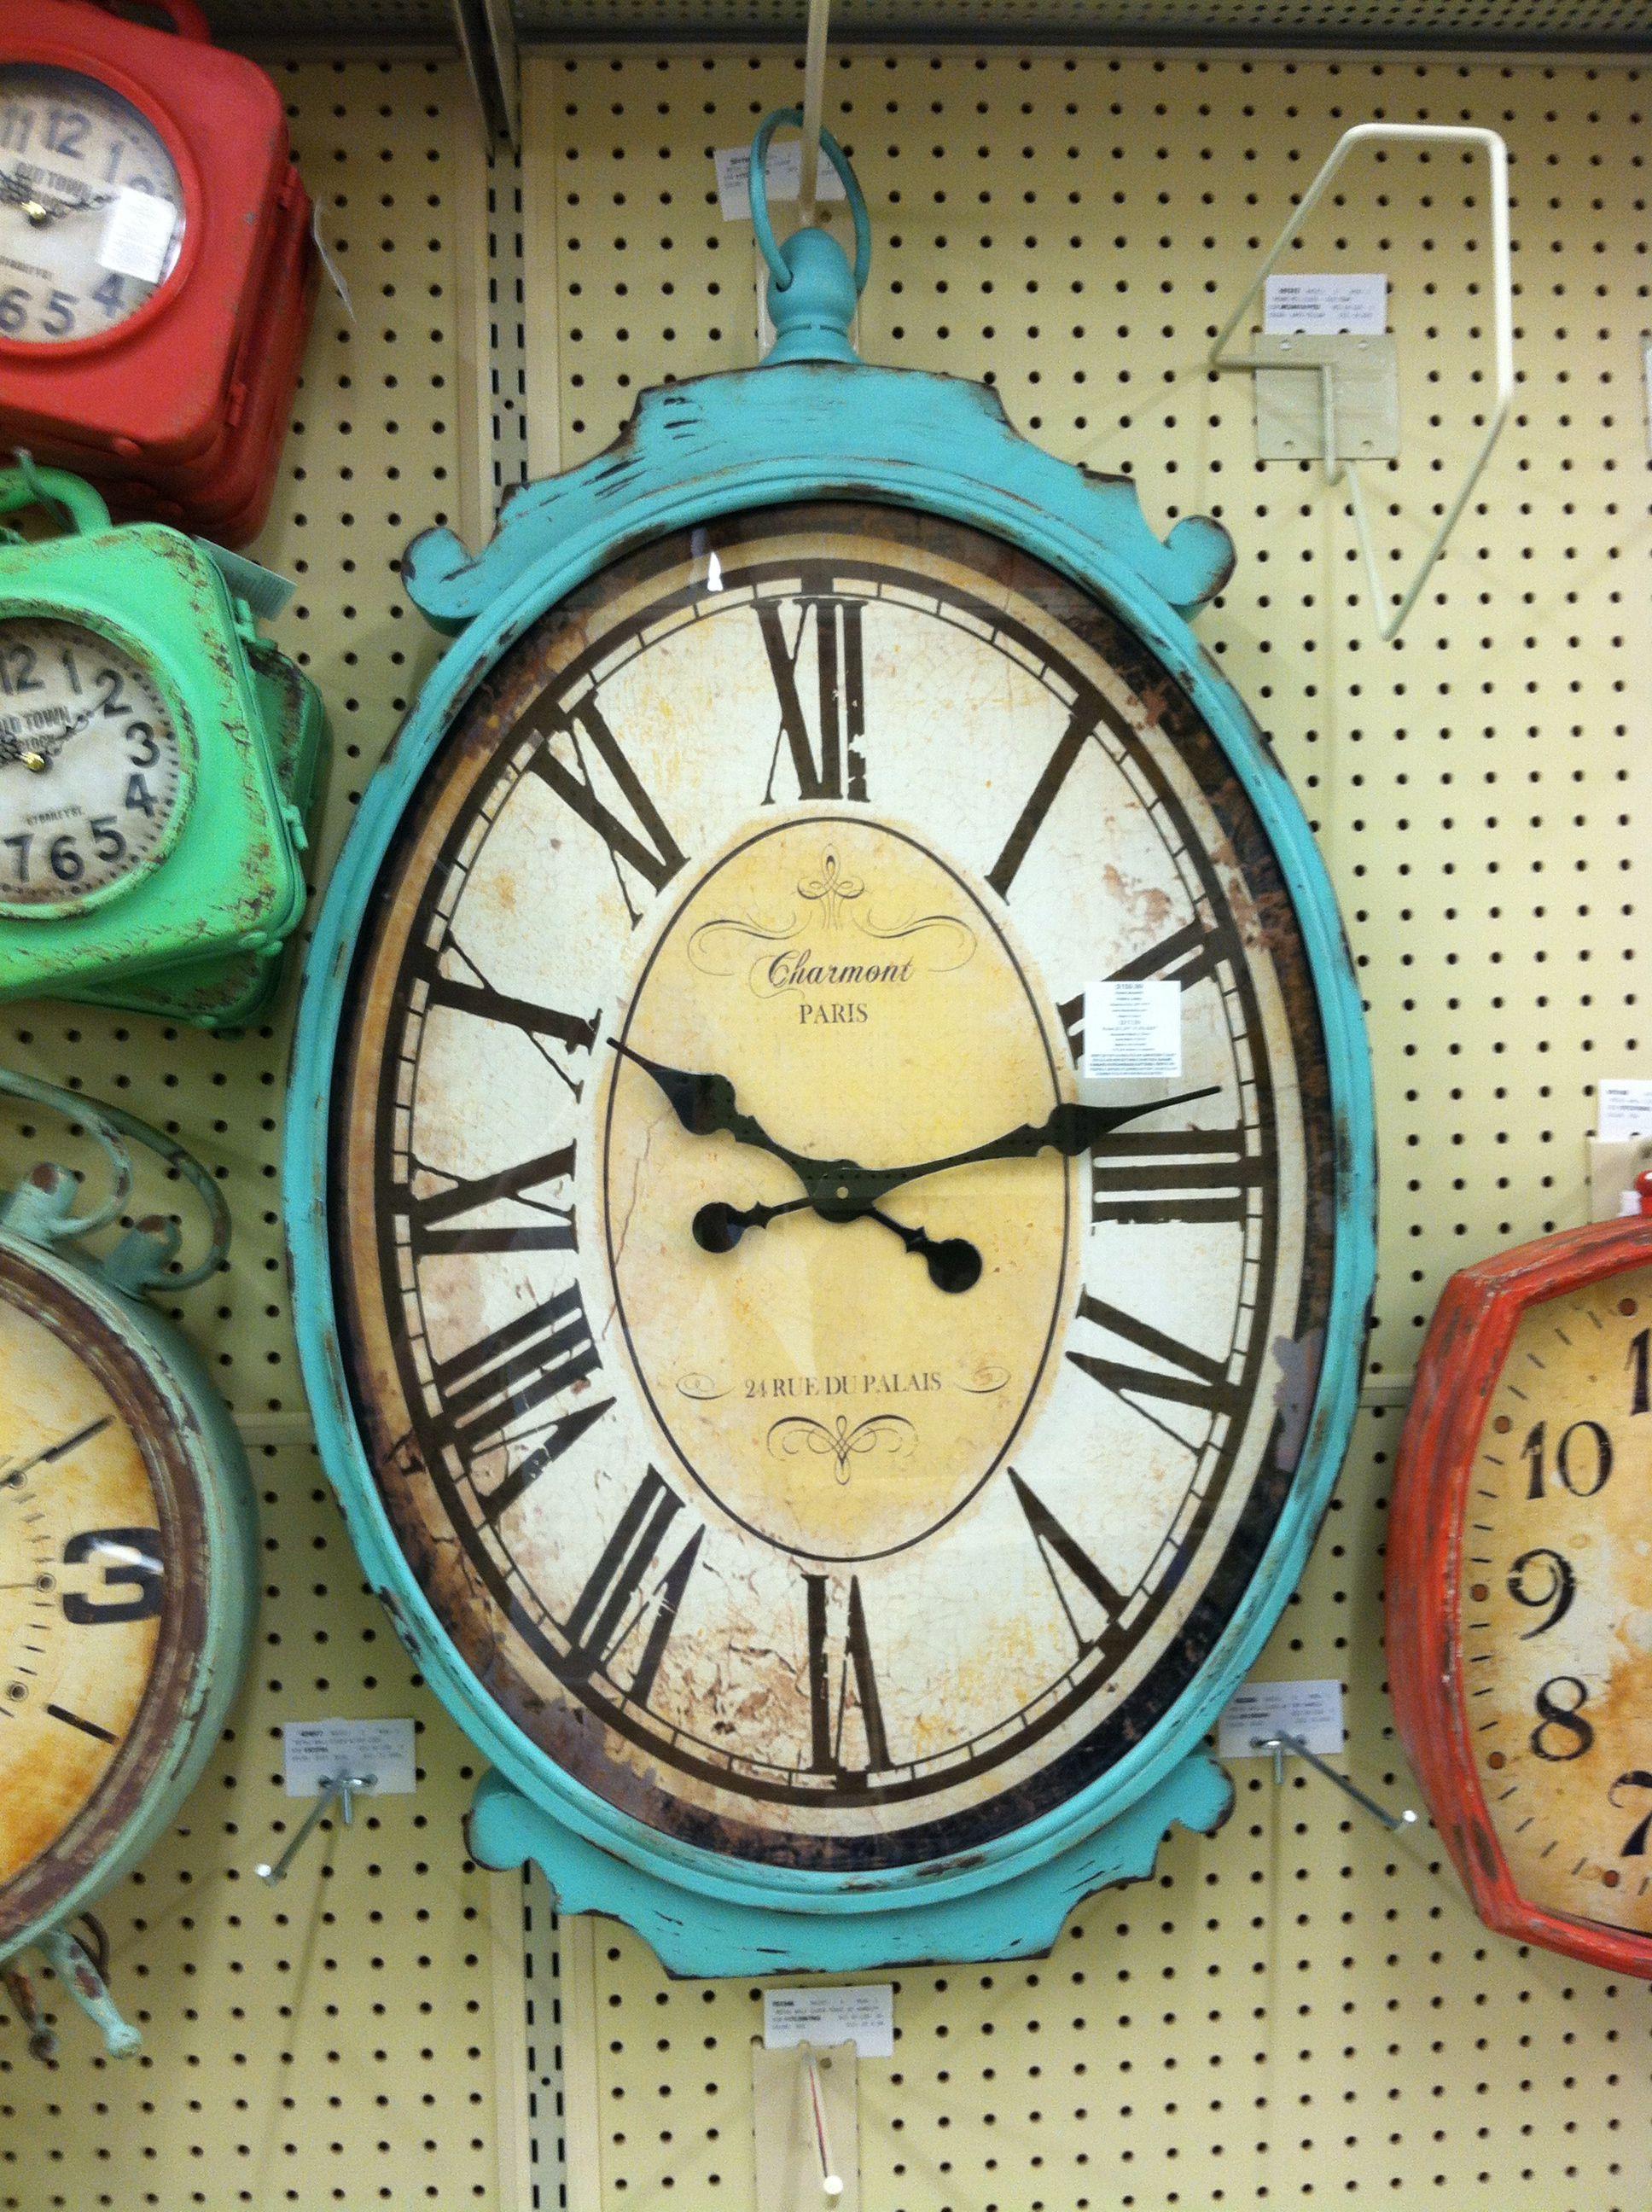 Clock Over Fireplace Luxury Wall Clock at Hobby Lobby Hobby Lobby Finds